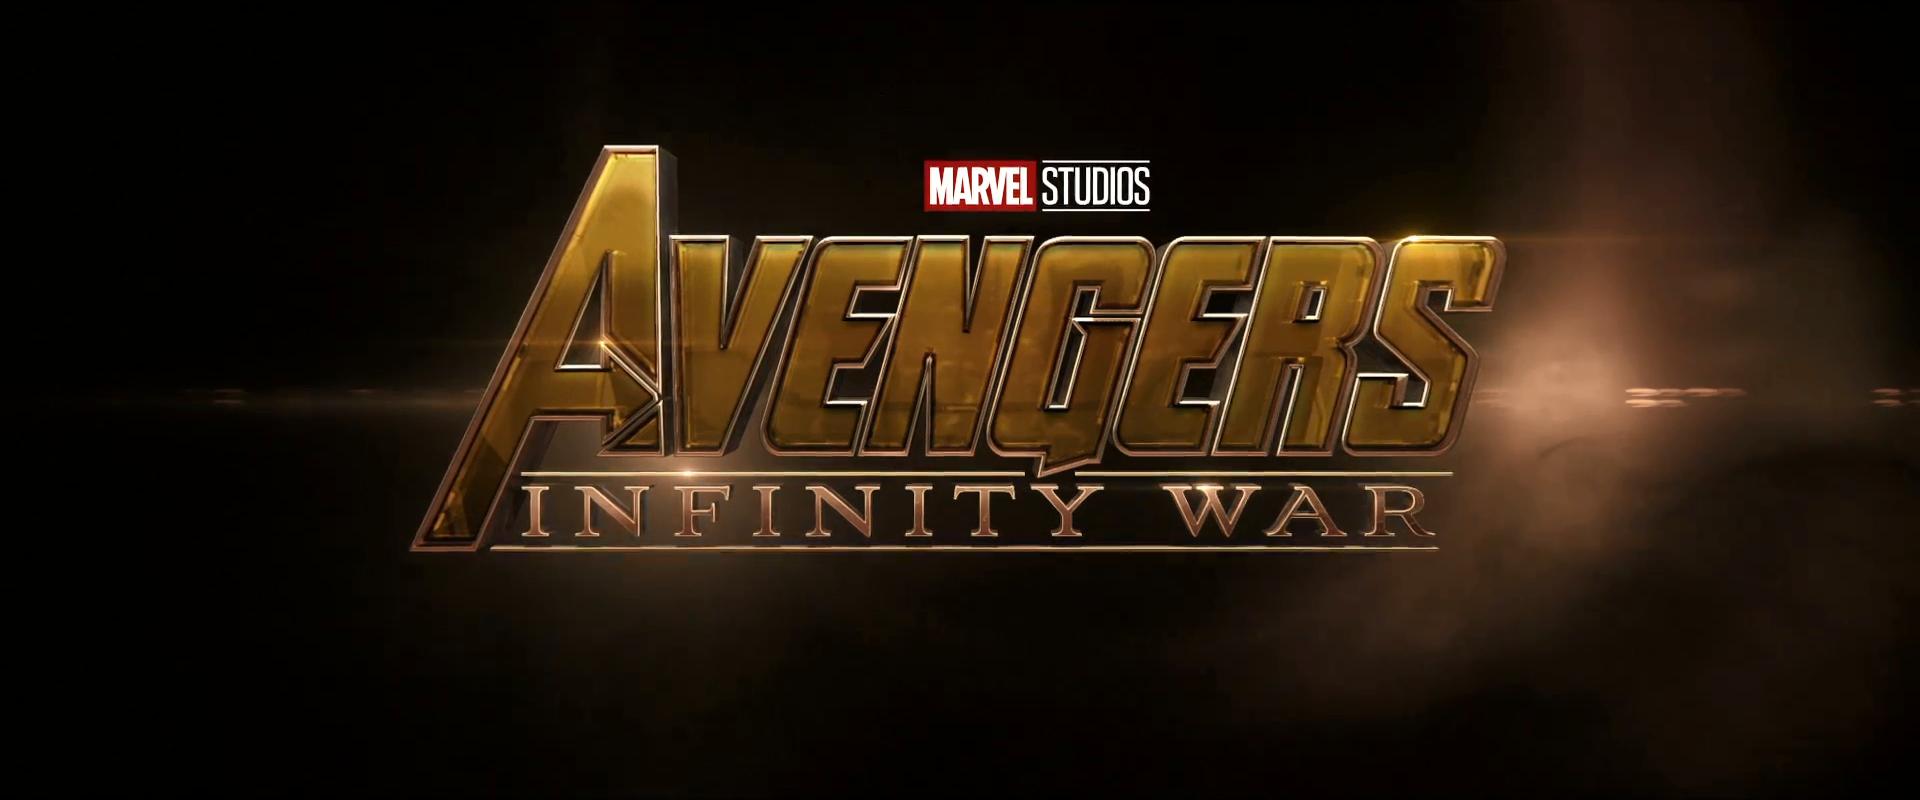 Avengers Infinity War Logo Infinity War Avengers Infinity War Avengers